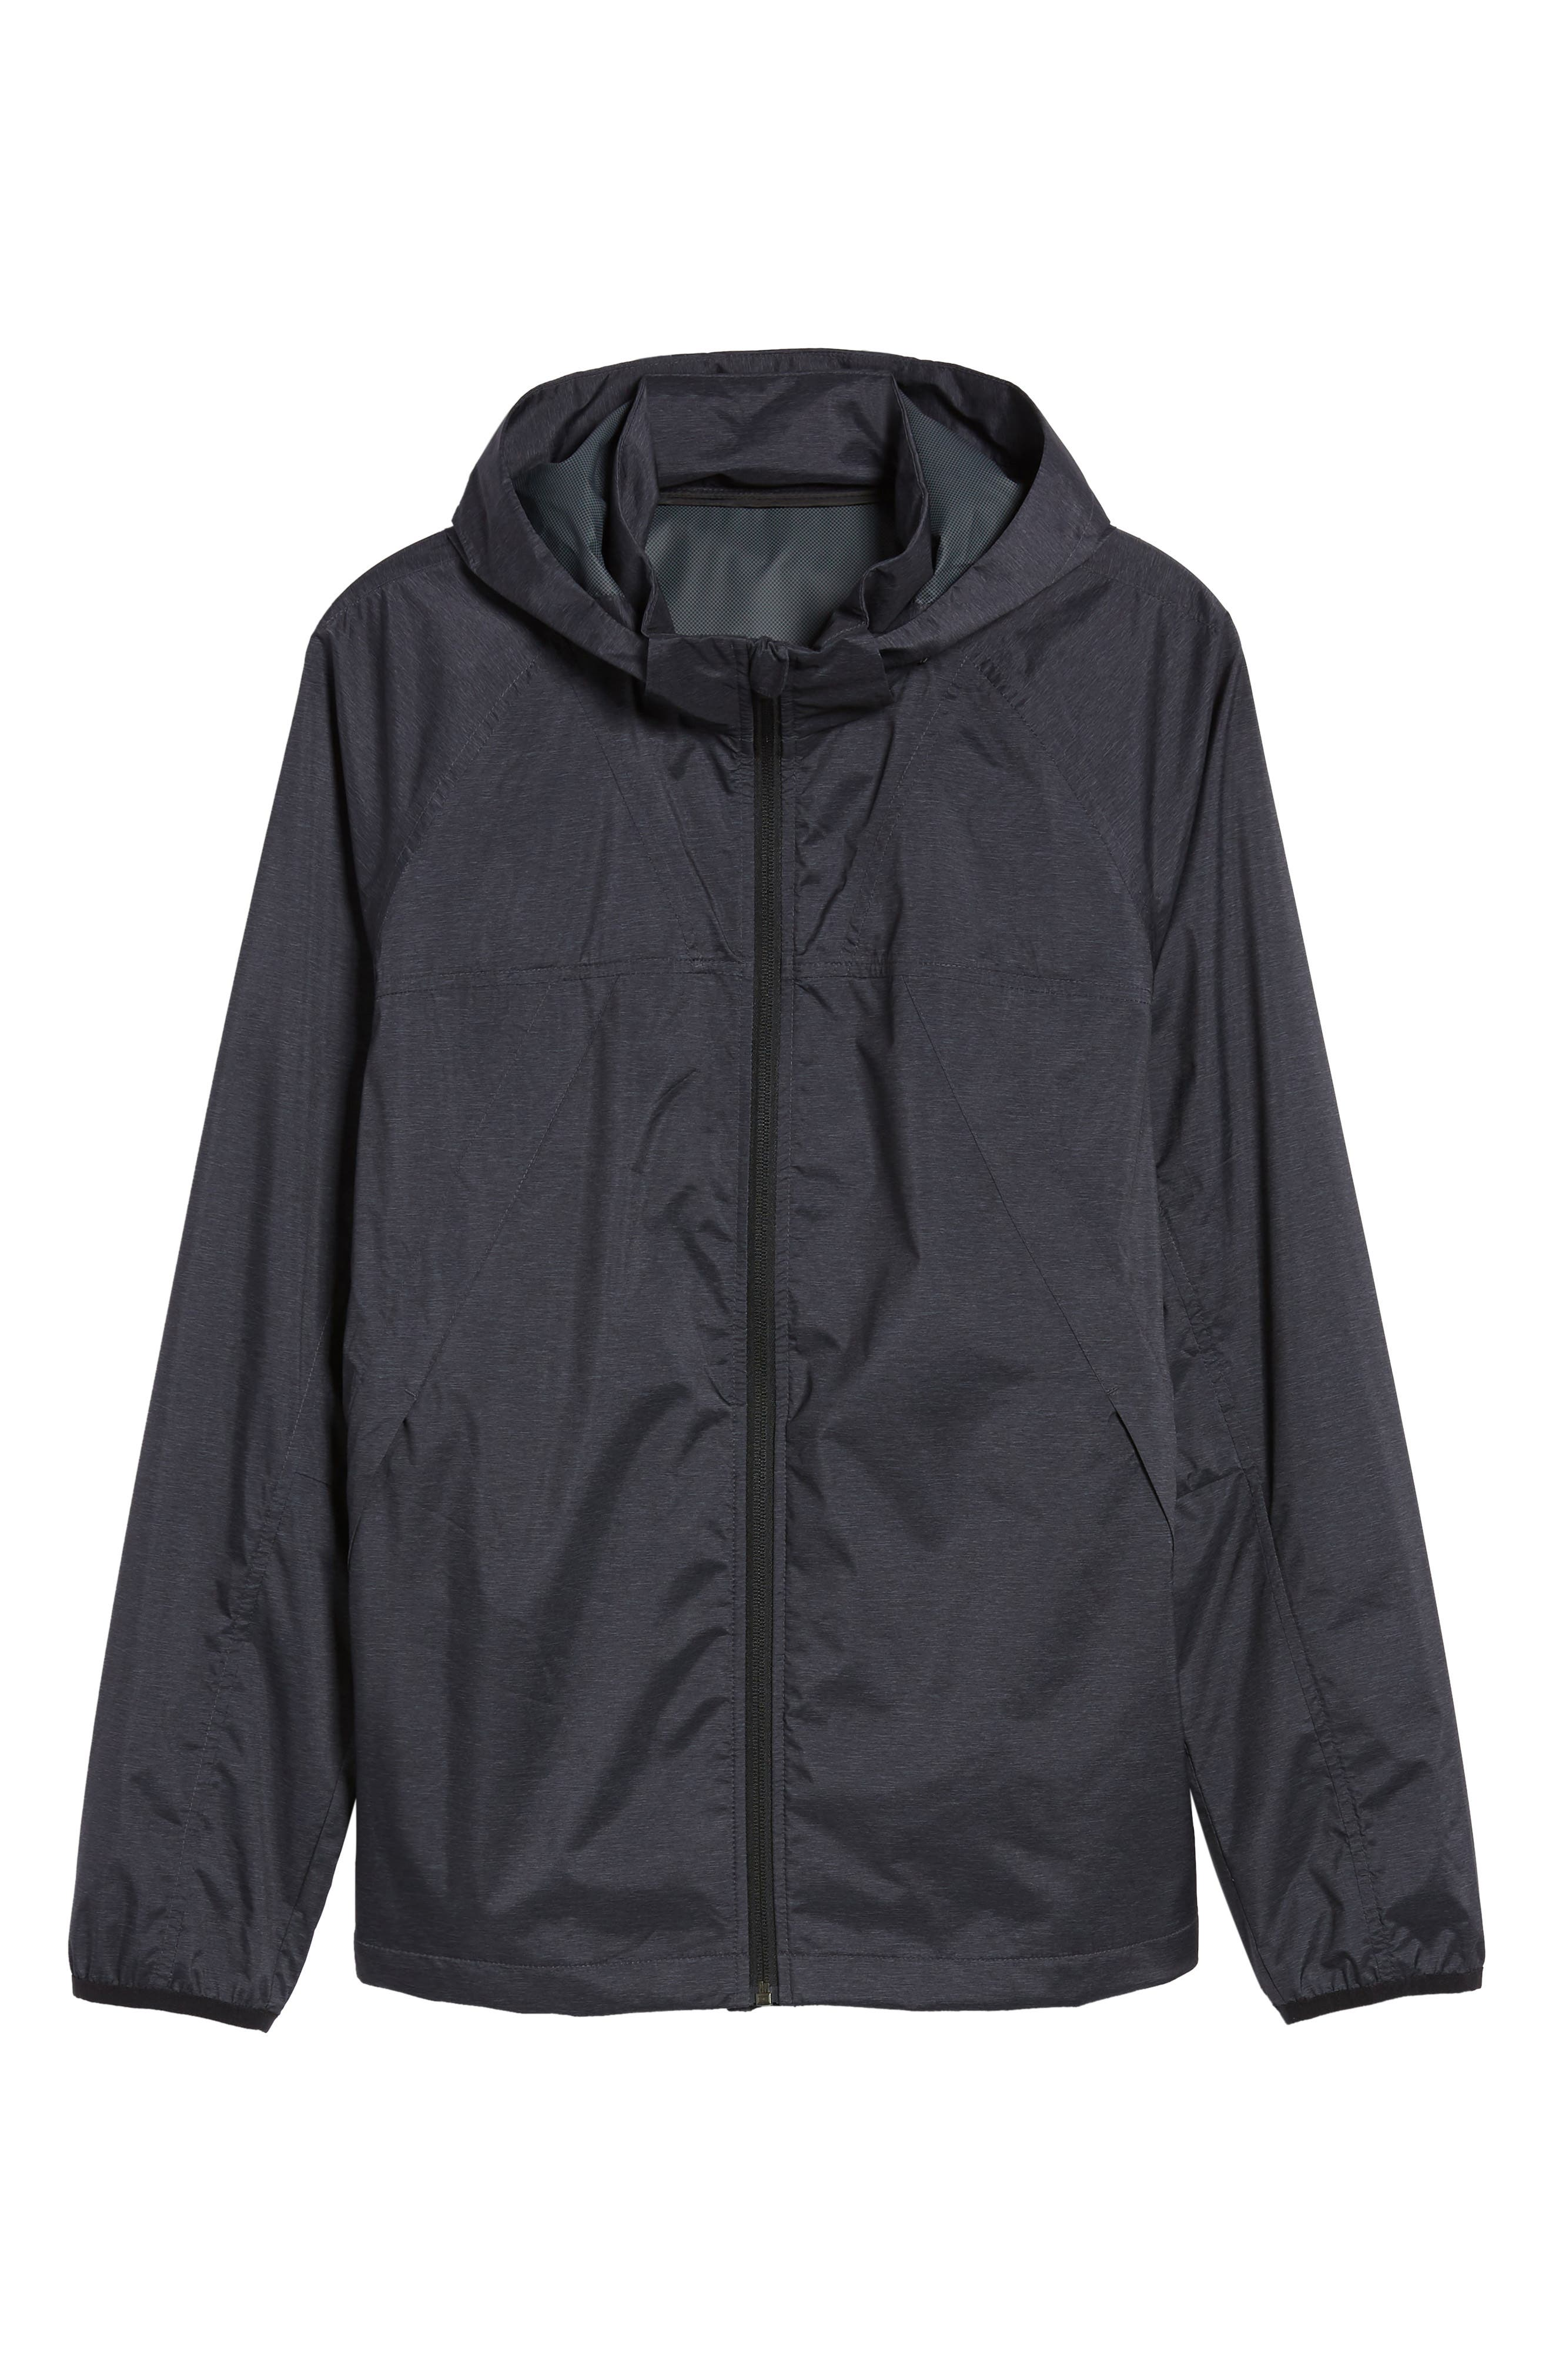 ZELLA,                             Xieite Hooded Jacket,                             Alternate thumbnail 6, color,                             001